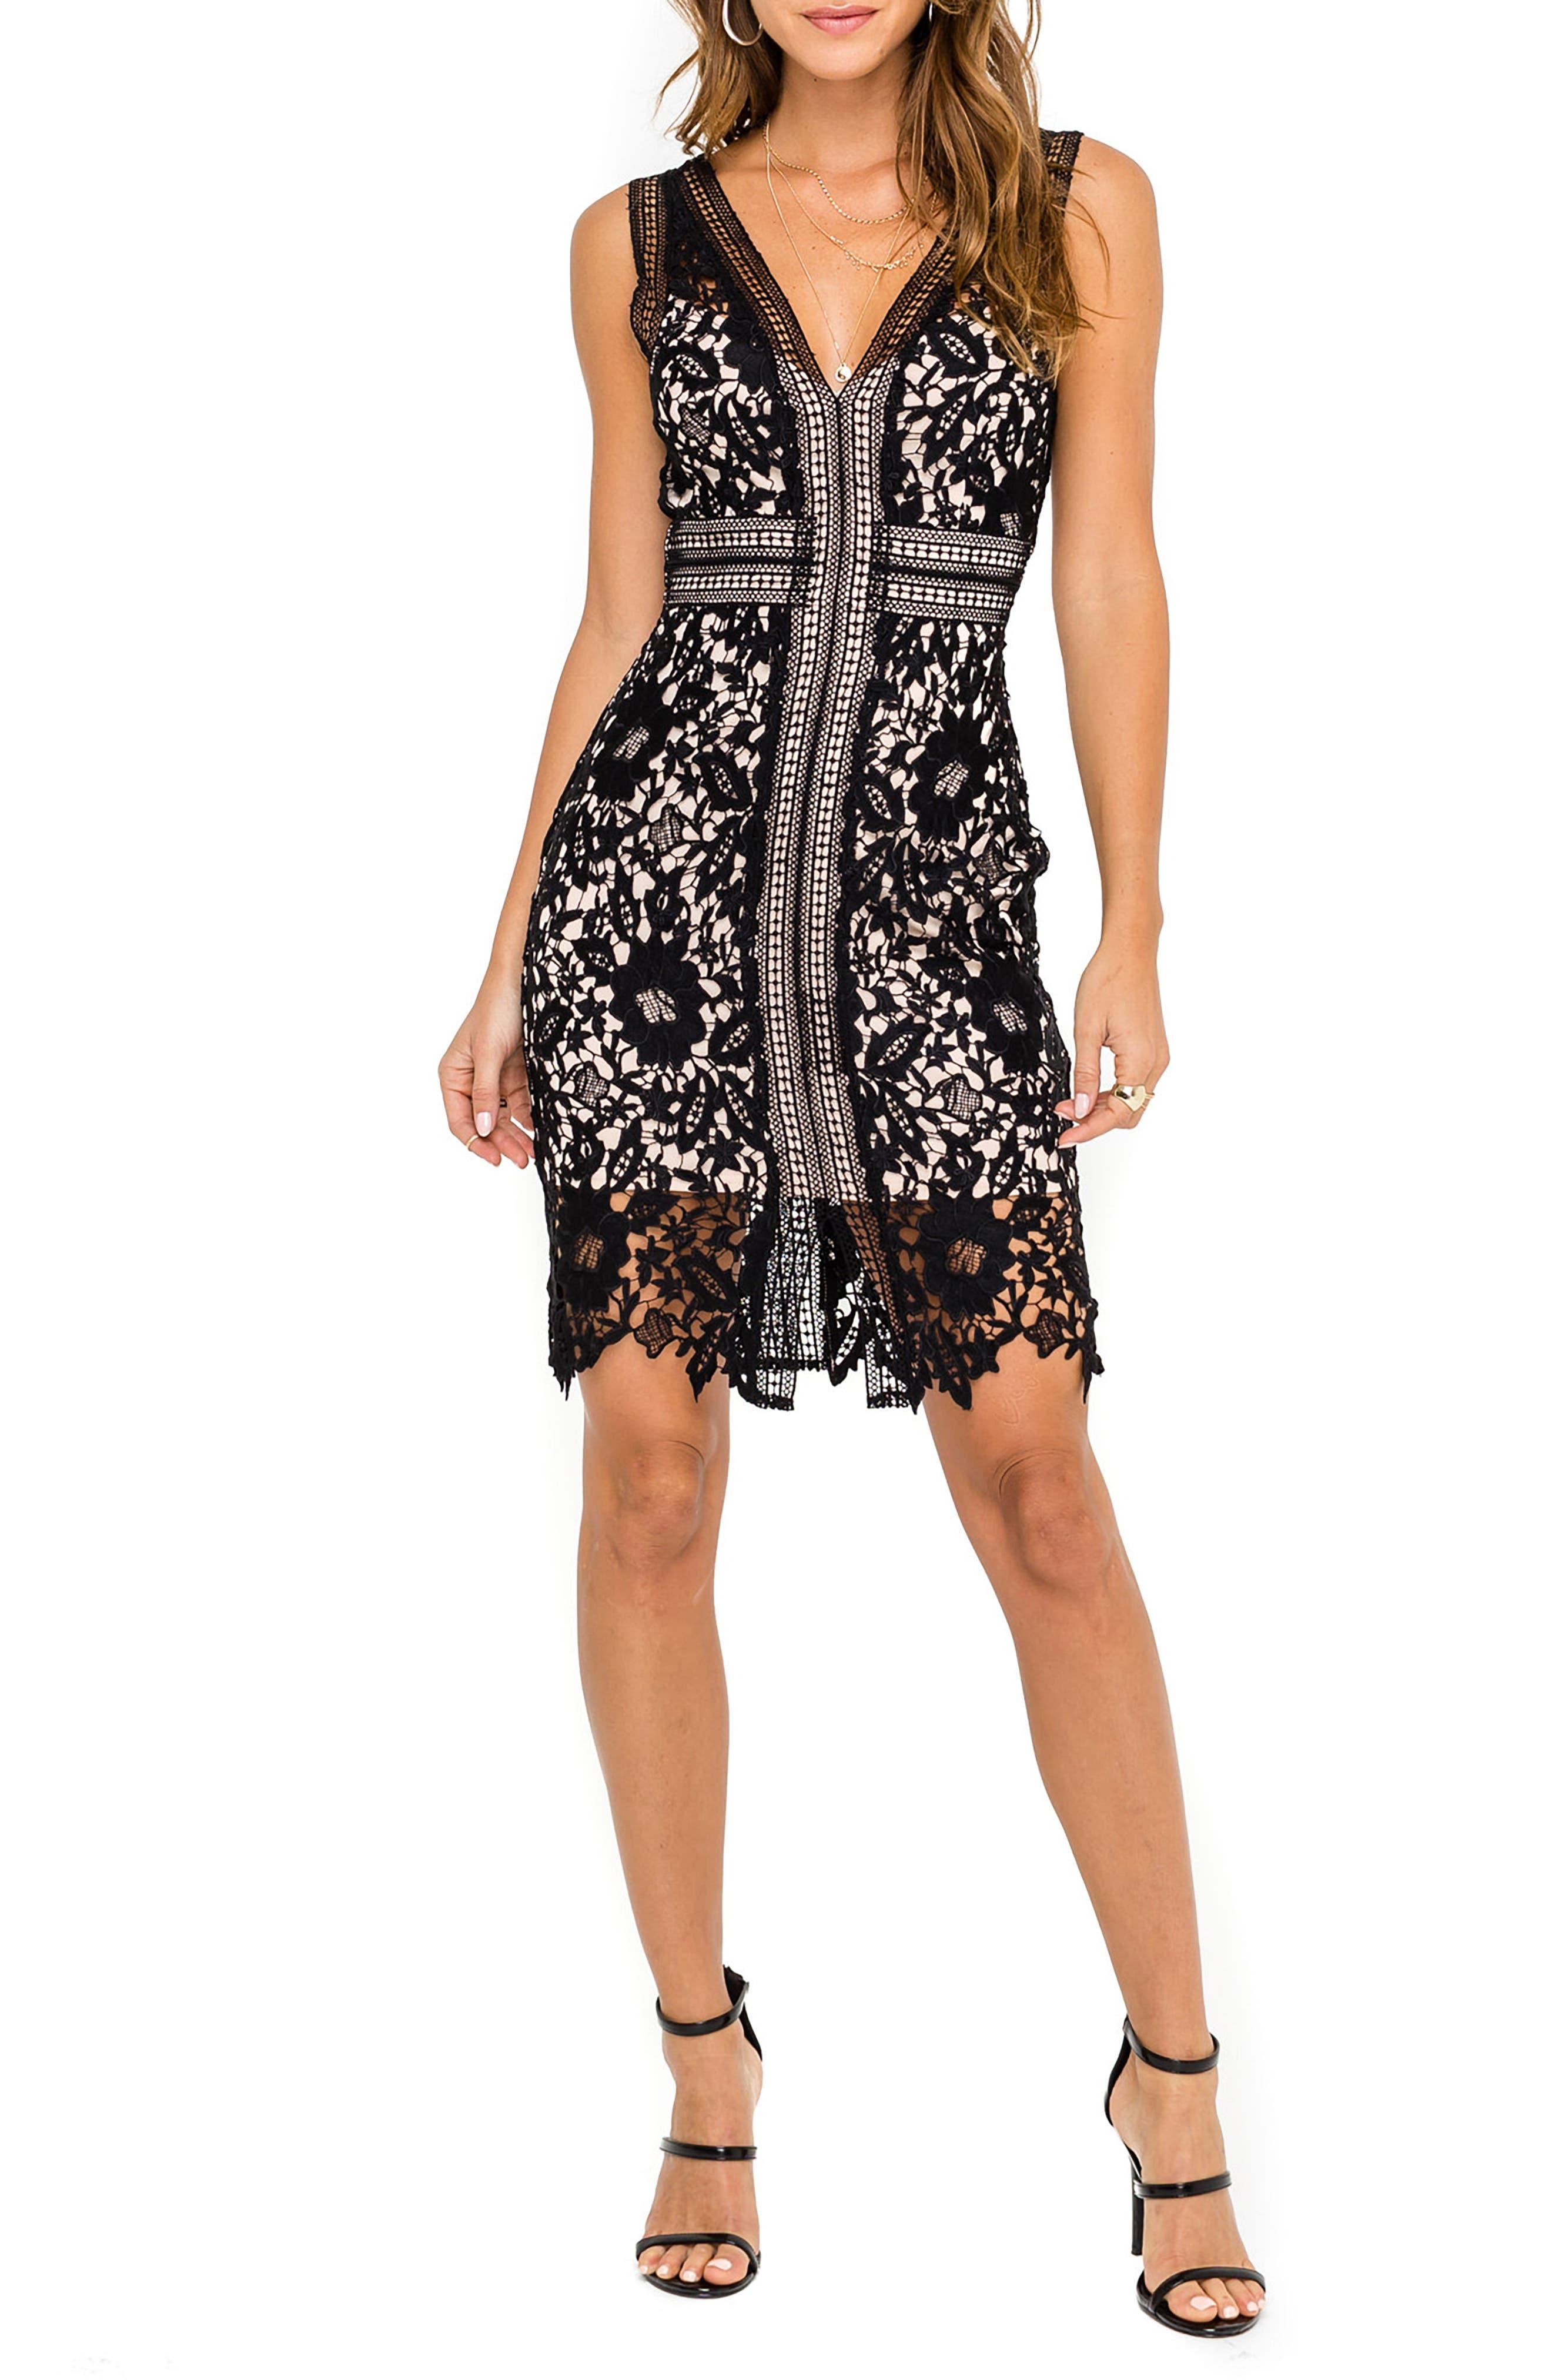 ASTR THE LABEL, Lace Sheath Dress, Main thumbnail 1, color, 001